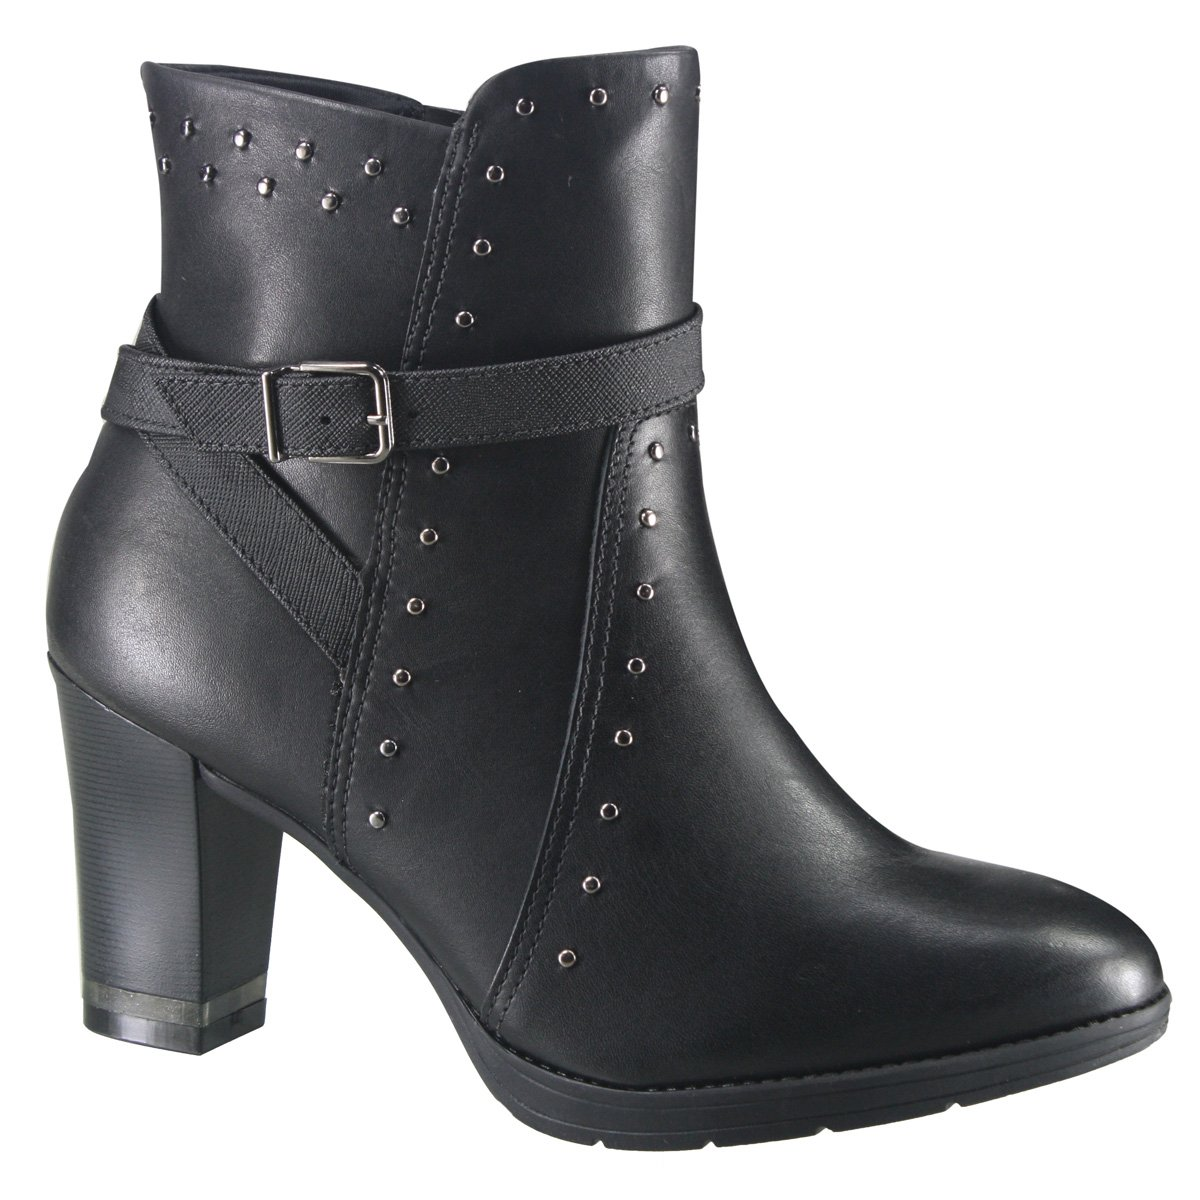 46a63cc60b73 Bota Feminina Ankle Boot Comfortflex 18-78303 000002 Preto (Bio Napa  Soft Bio